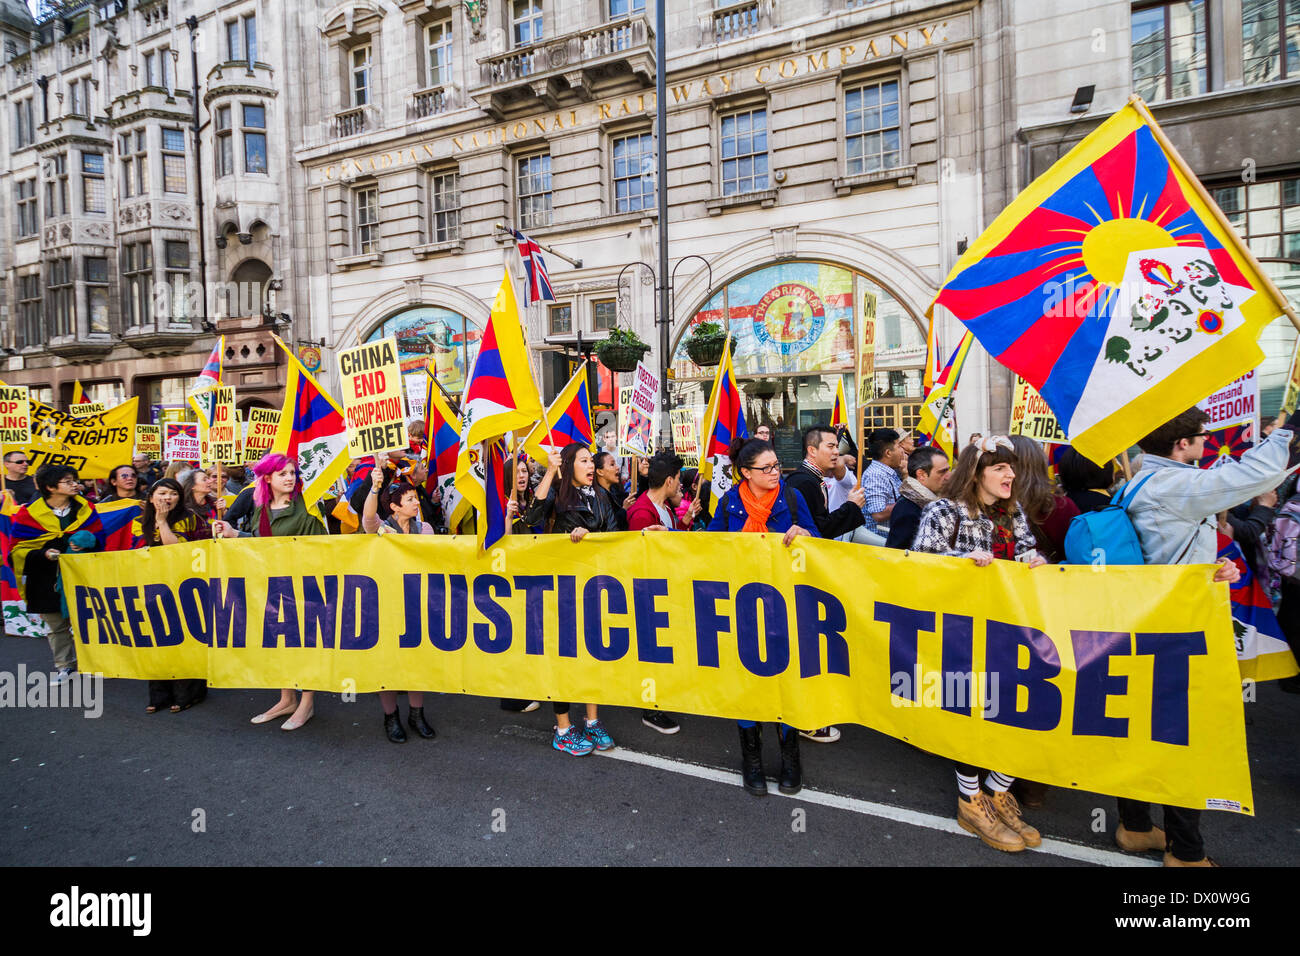 Tibet annuale marcia di protesta per la libertà da occupazione cinese a Londra Immagini Stock